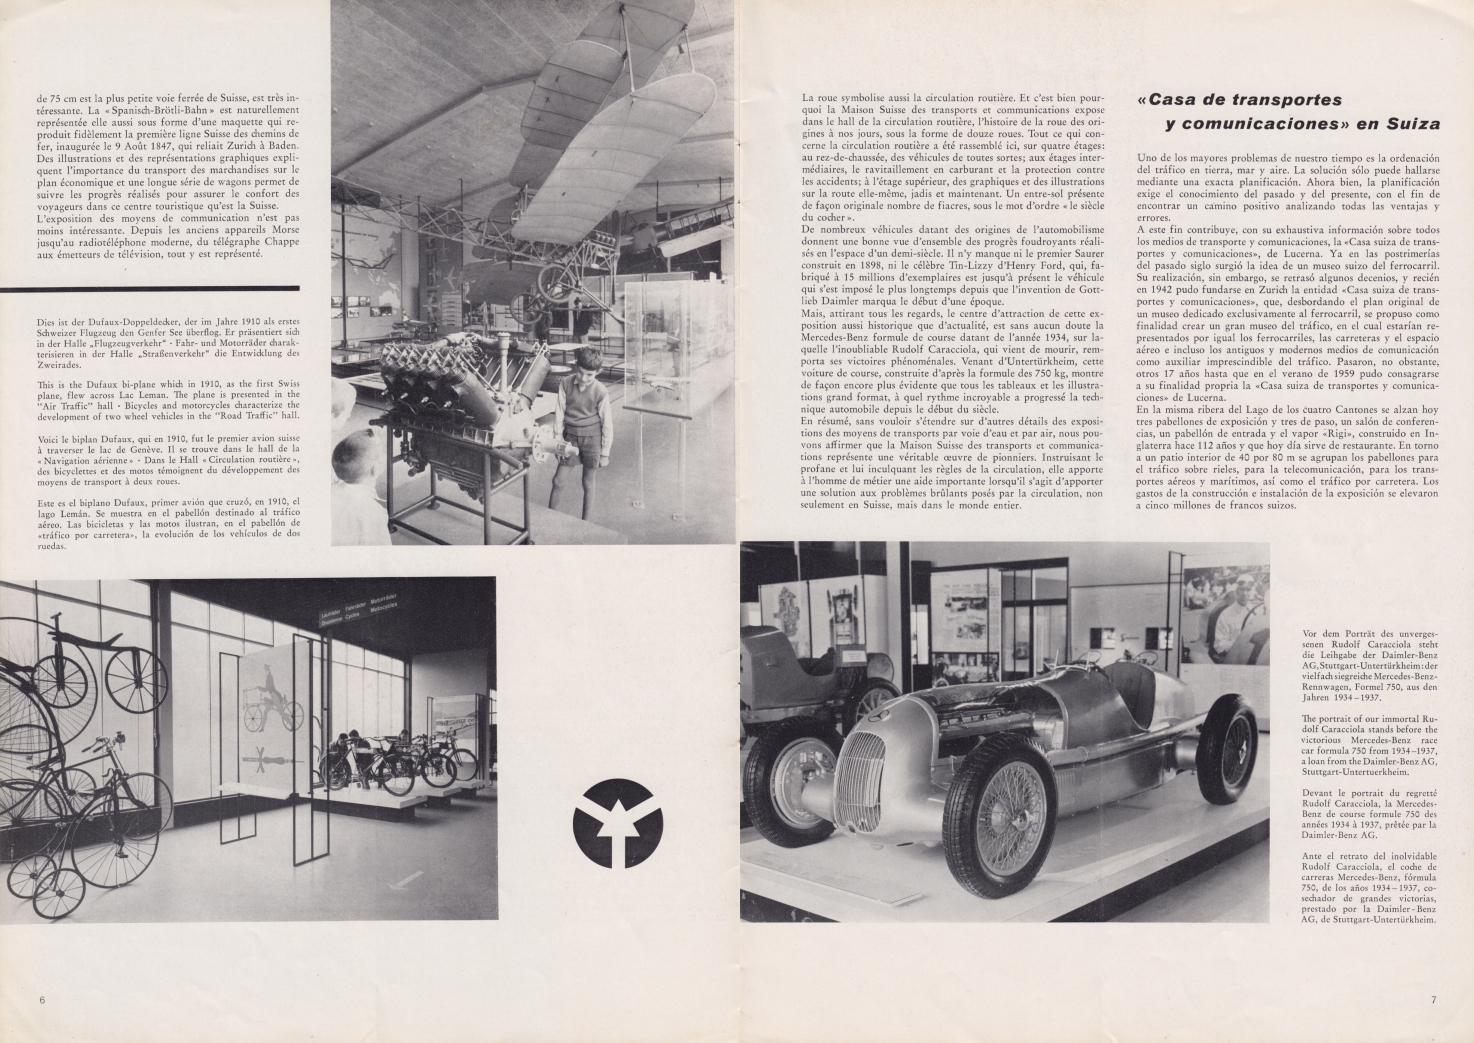 (REVISTA): Periódico In aller welt n.º 37 - Mercedes-Benz no mundo - 1959 - multilingue 004